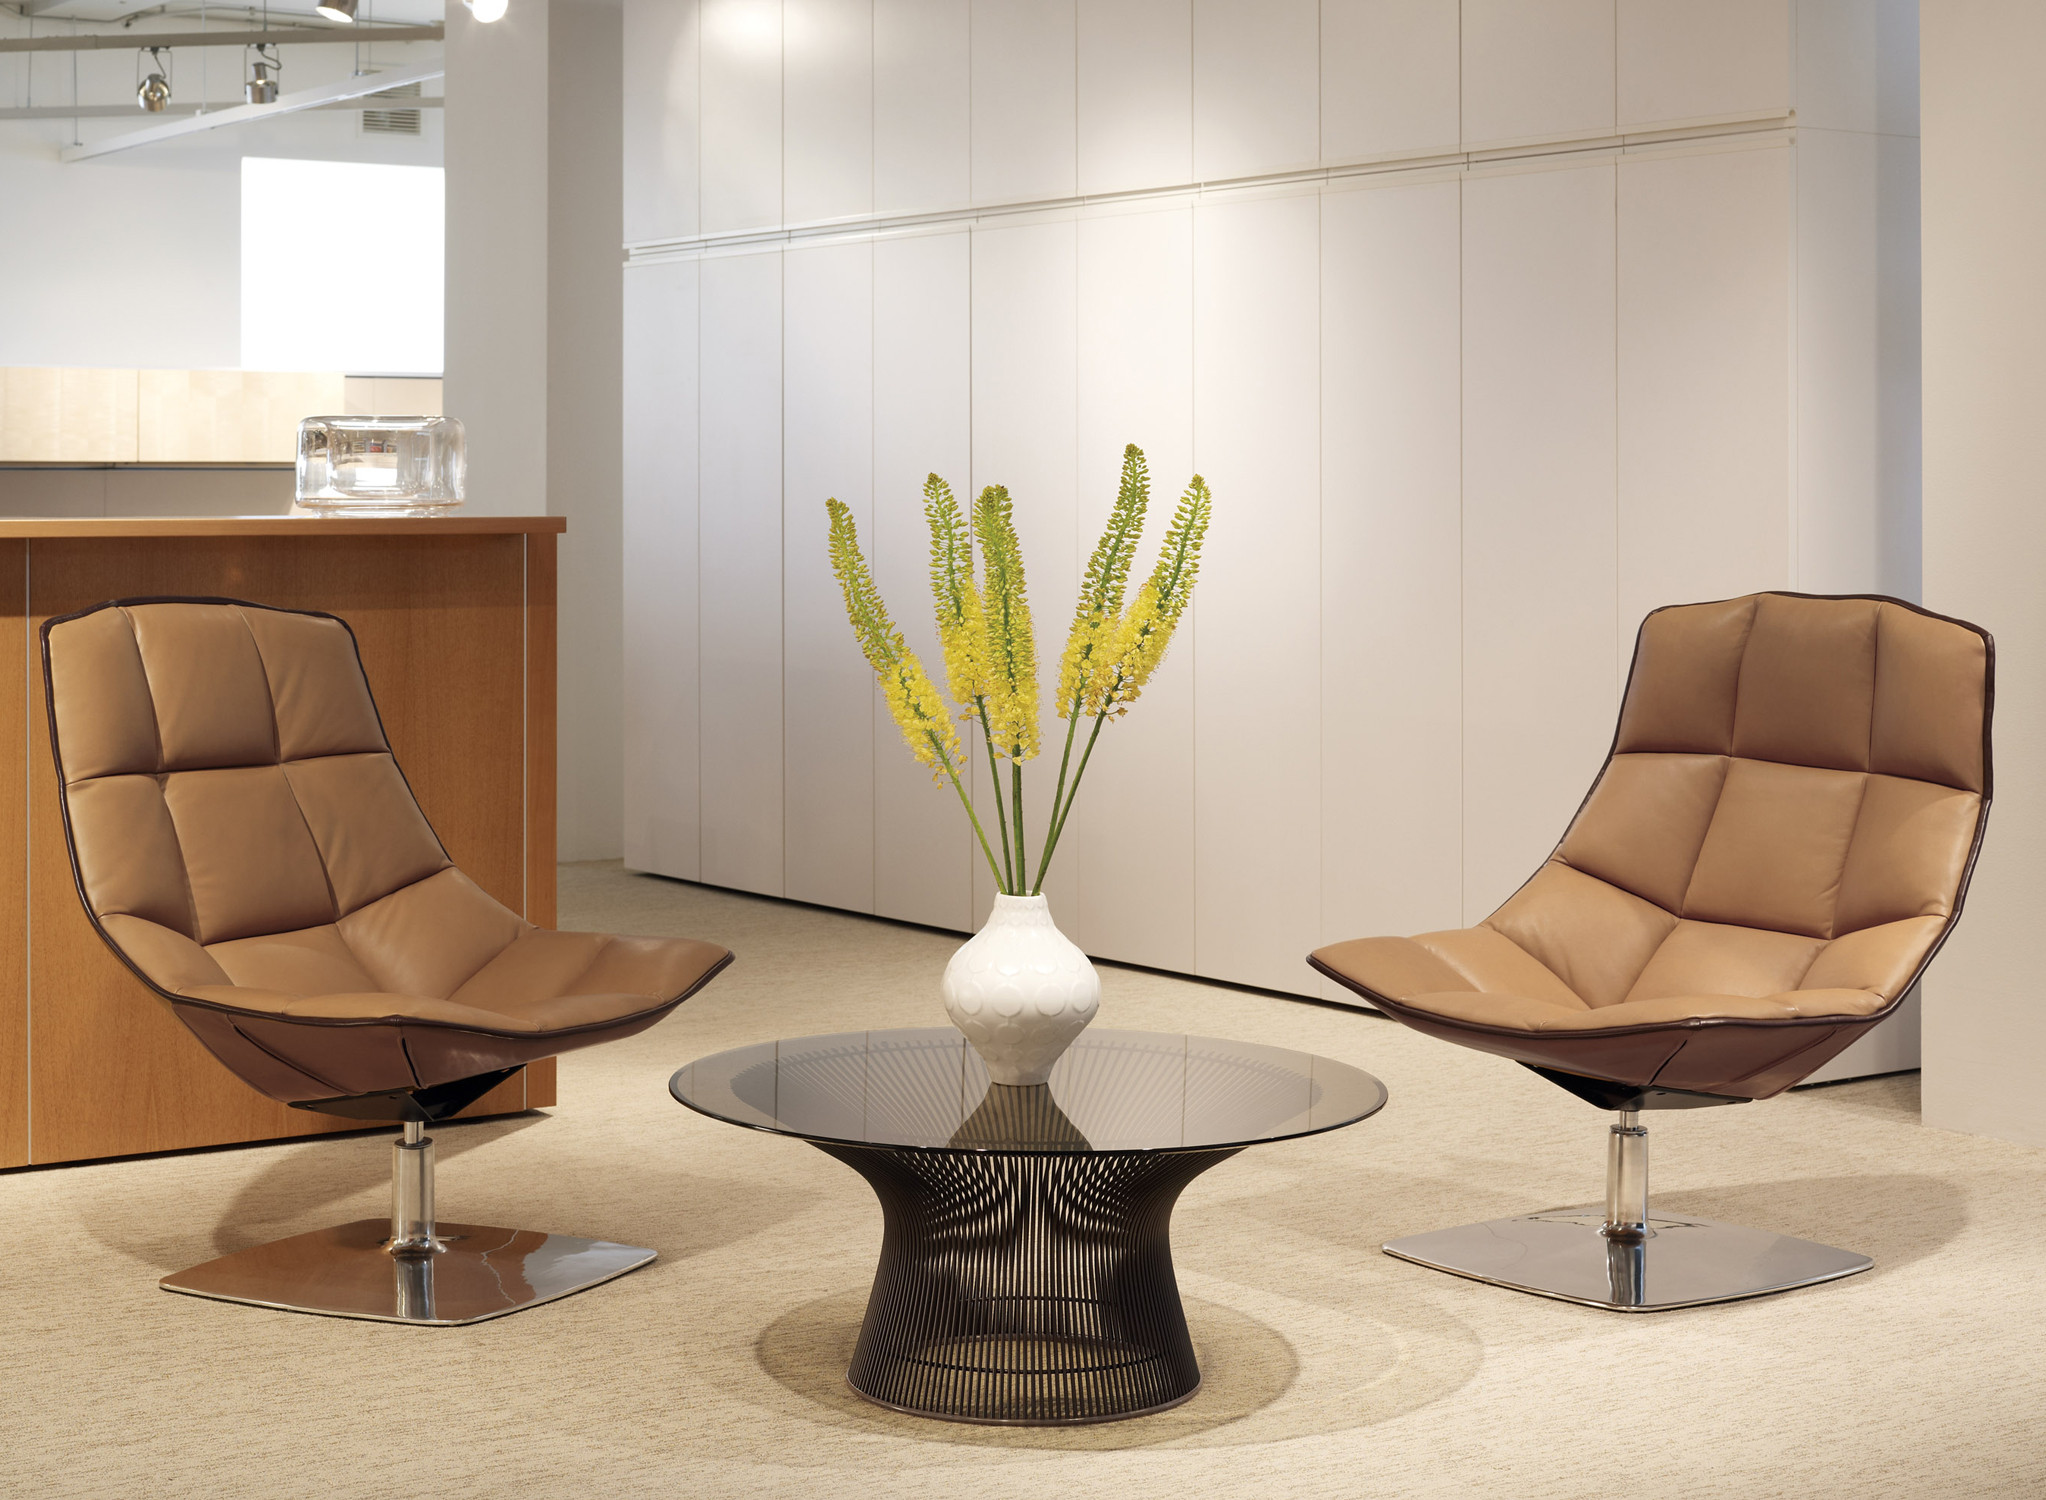 Jehs + Laub Home Lounge Chairs